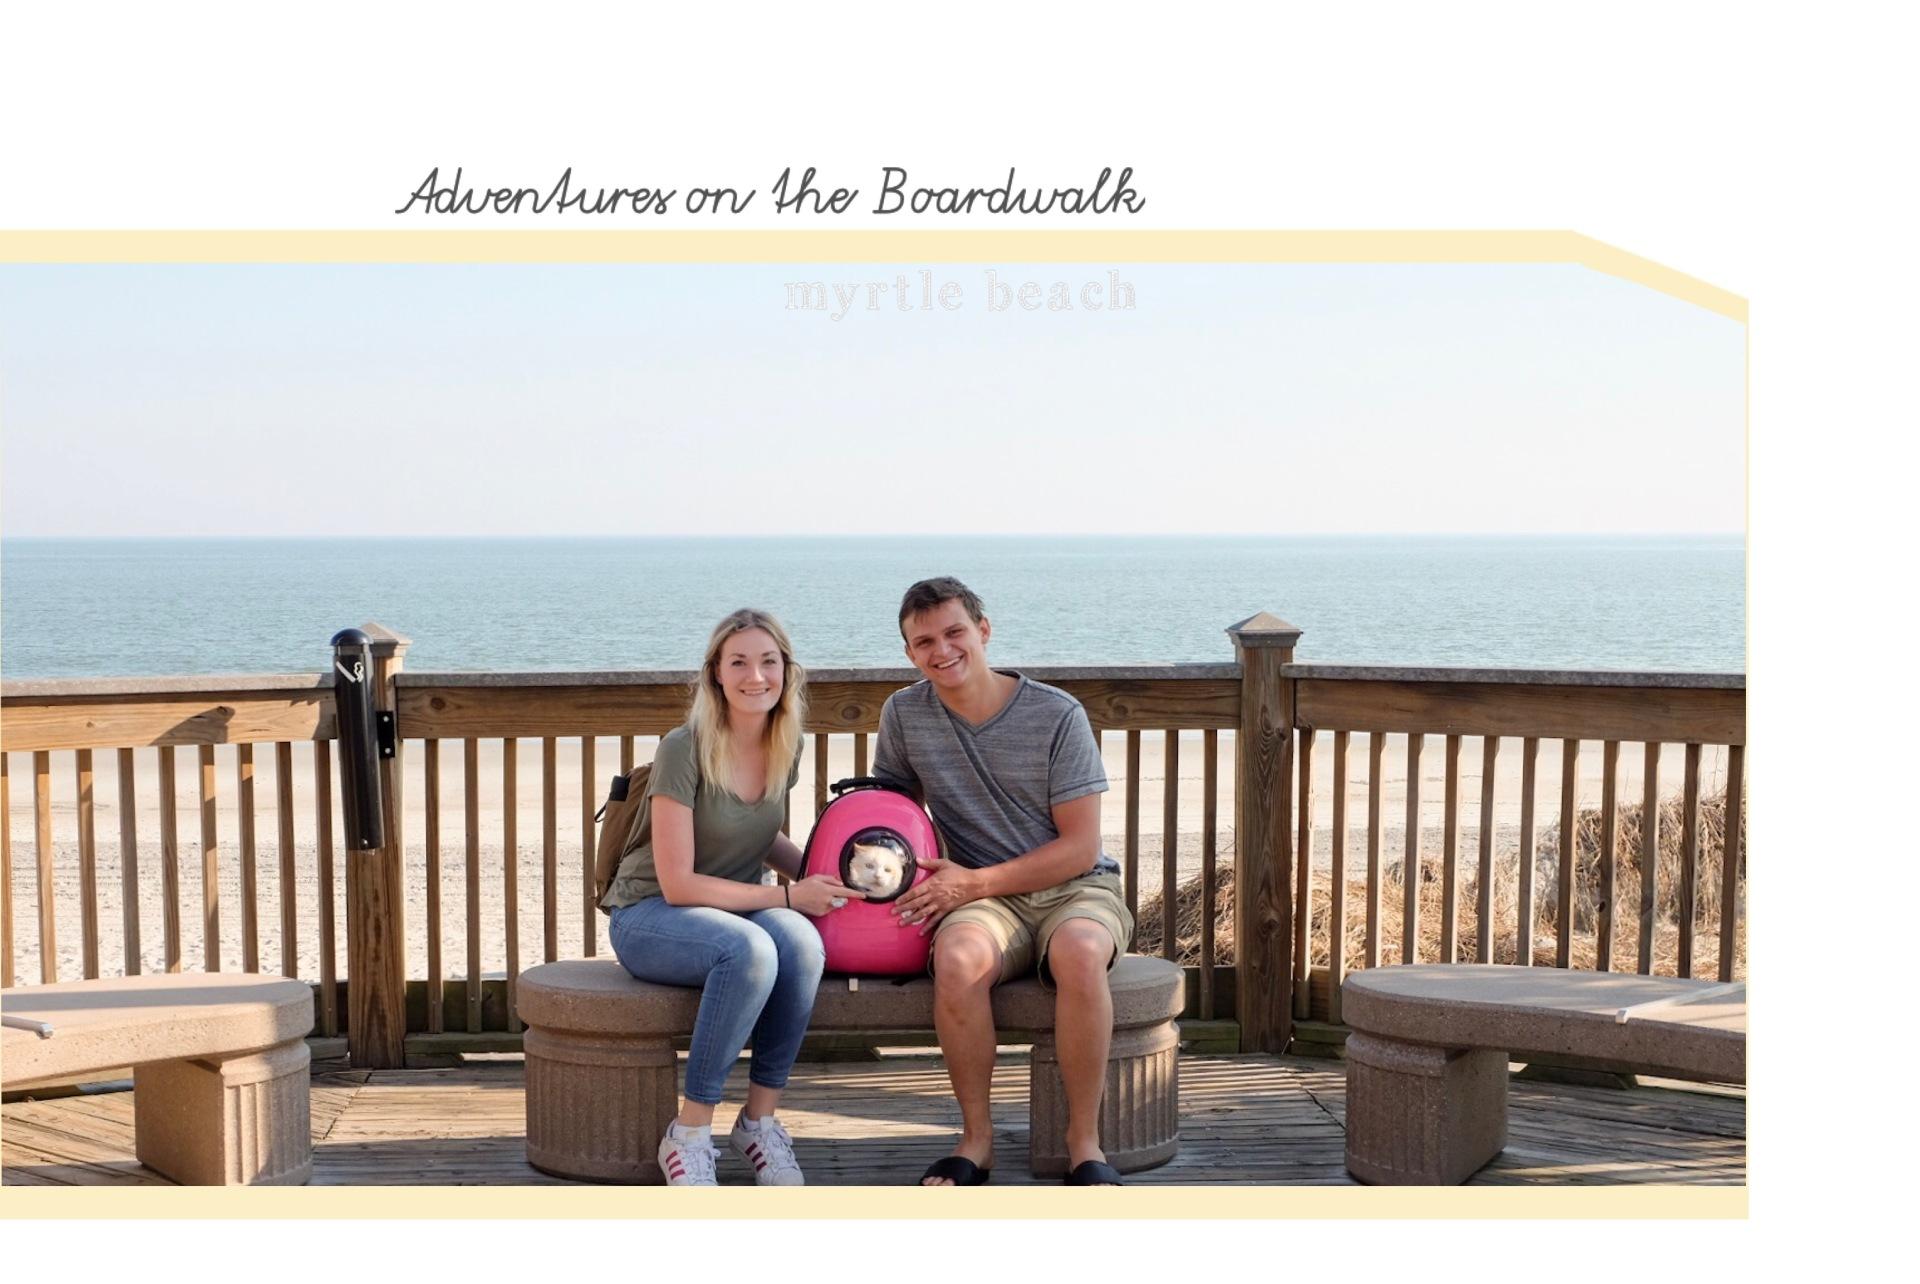 Adventures on the Boardwalk